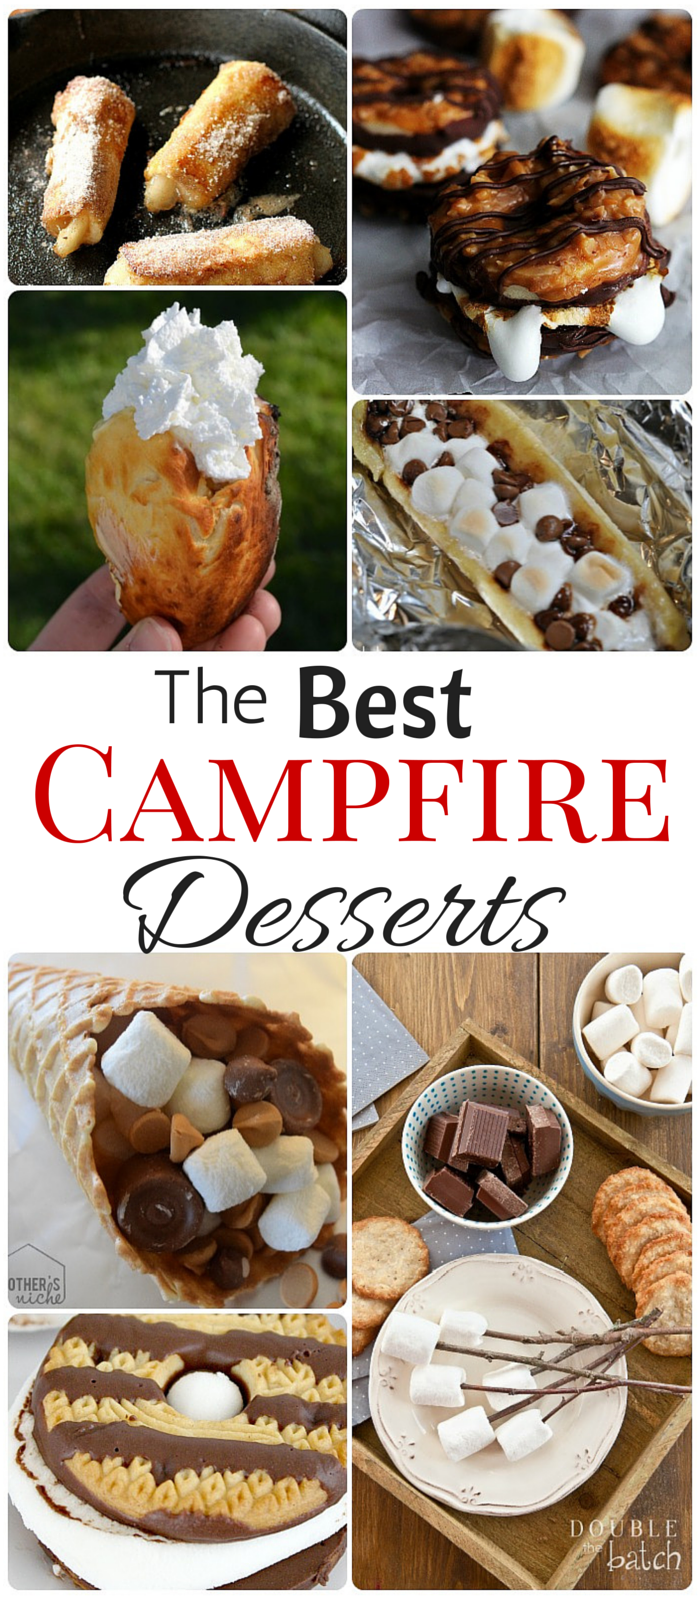 Best Campfire Desserts Easy Camping Dessert Reipes Smores